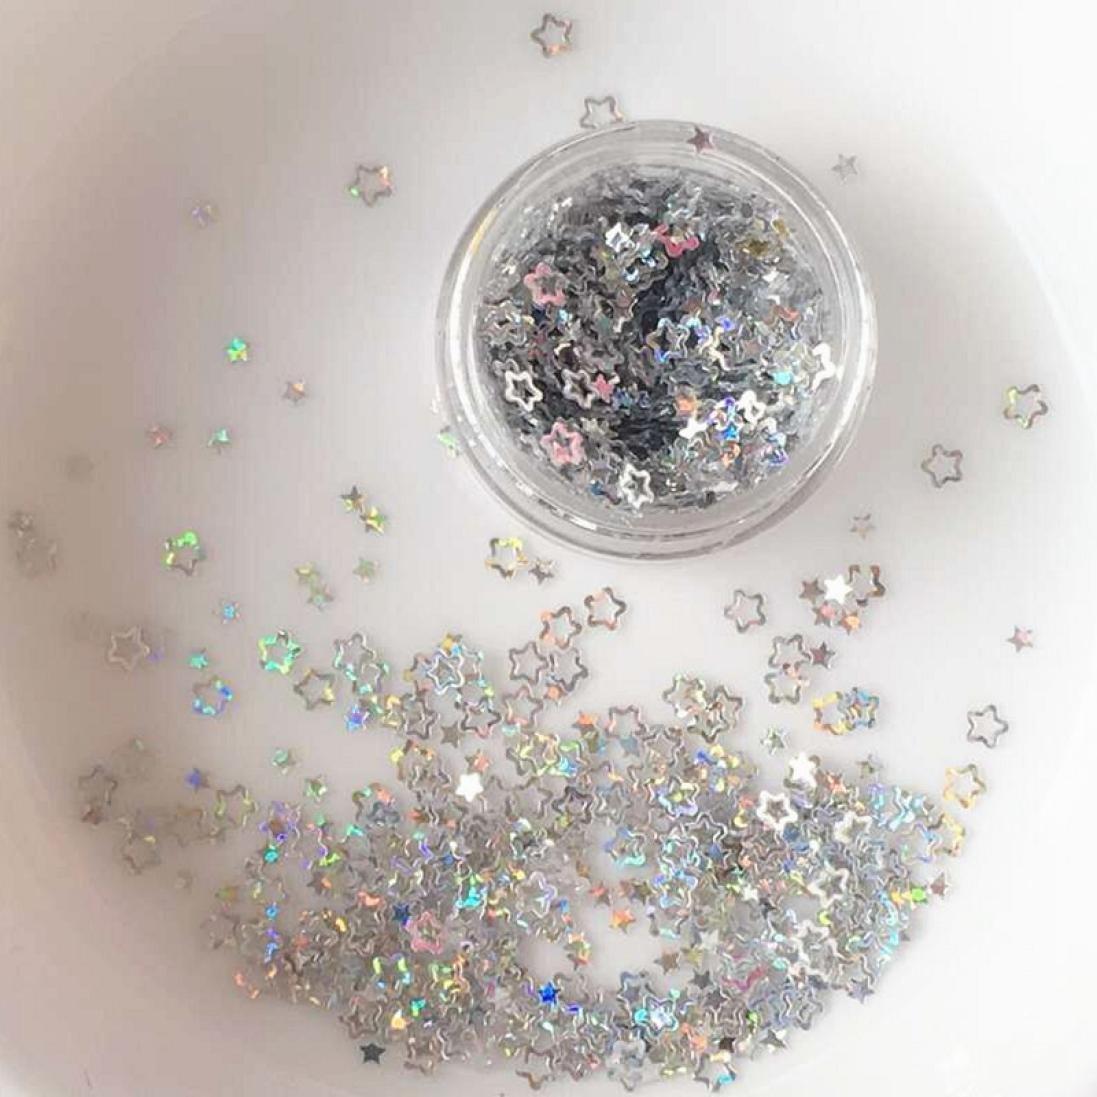 DZT1968 5g/bottle Flake Chunky holographic Glitter Pots Nail Face Eye Shadow Tattoo Festival Body Dance Party (E)